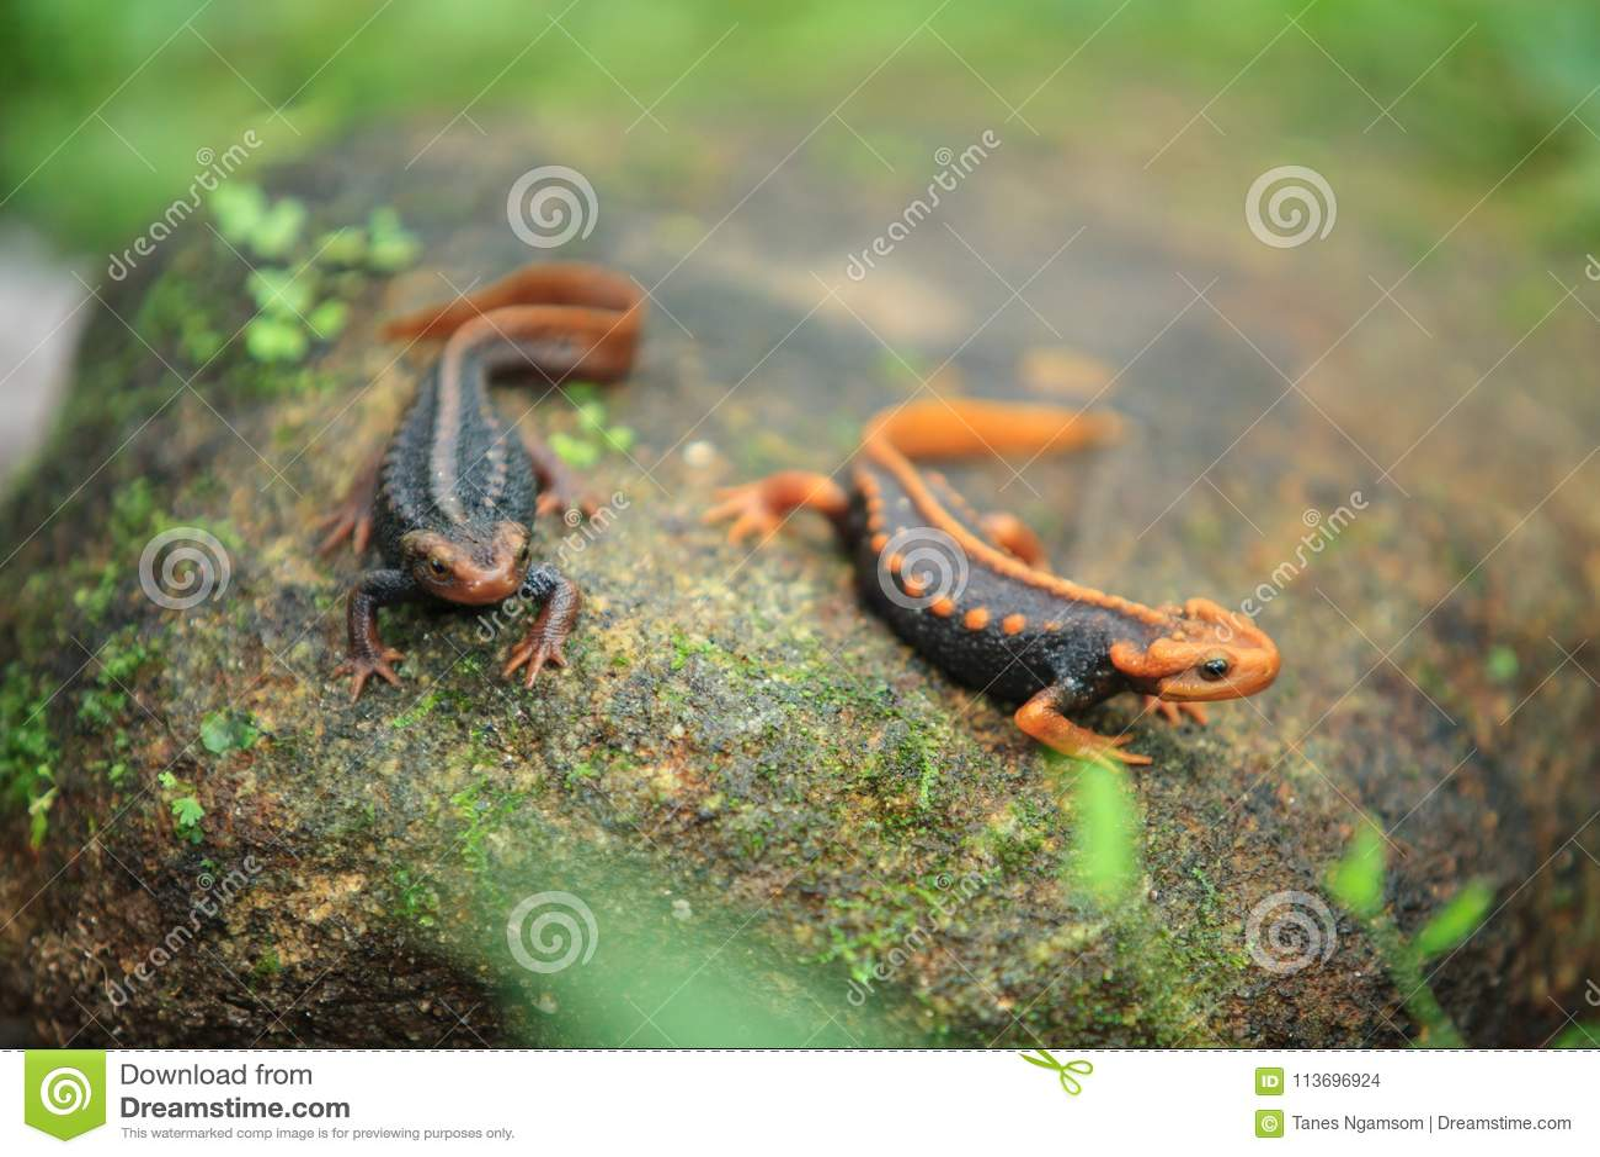 De krokodilsalamander is gevonden op Doi Inthanon, hig